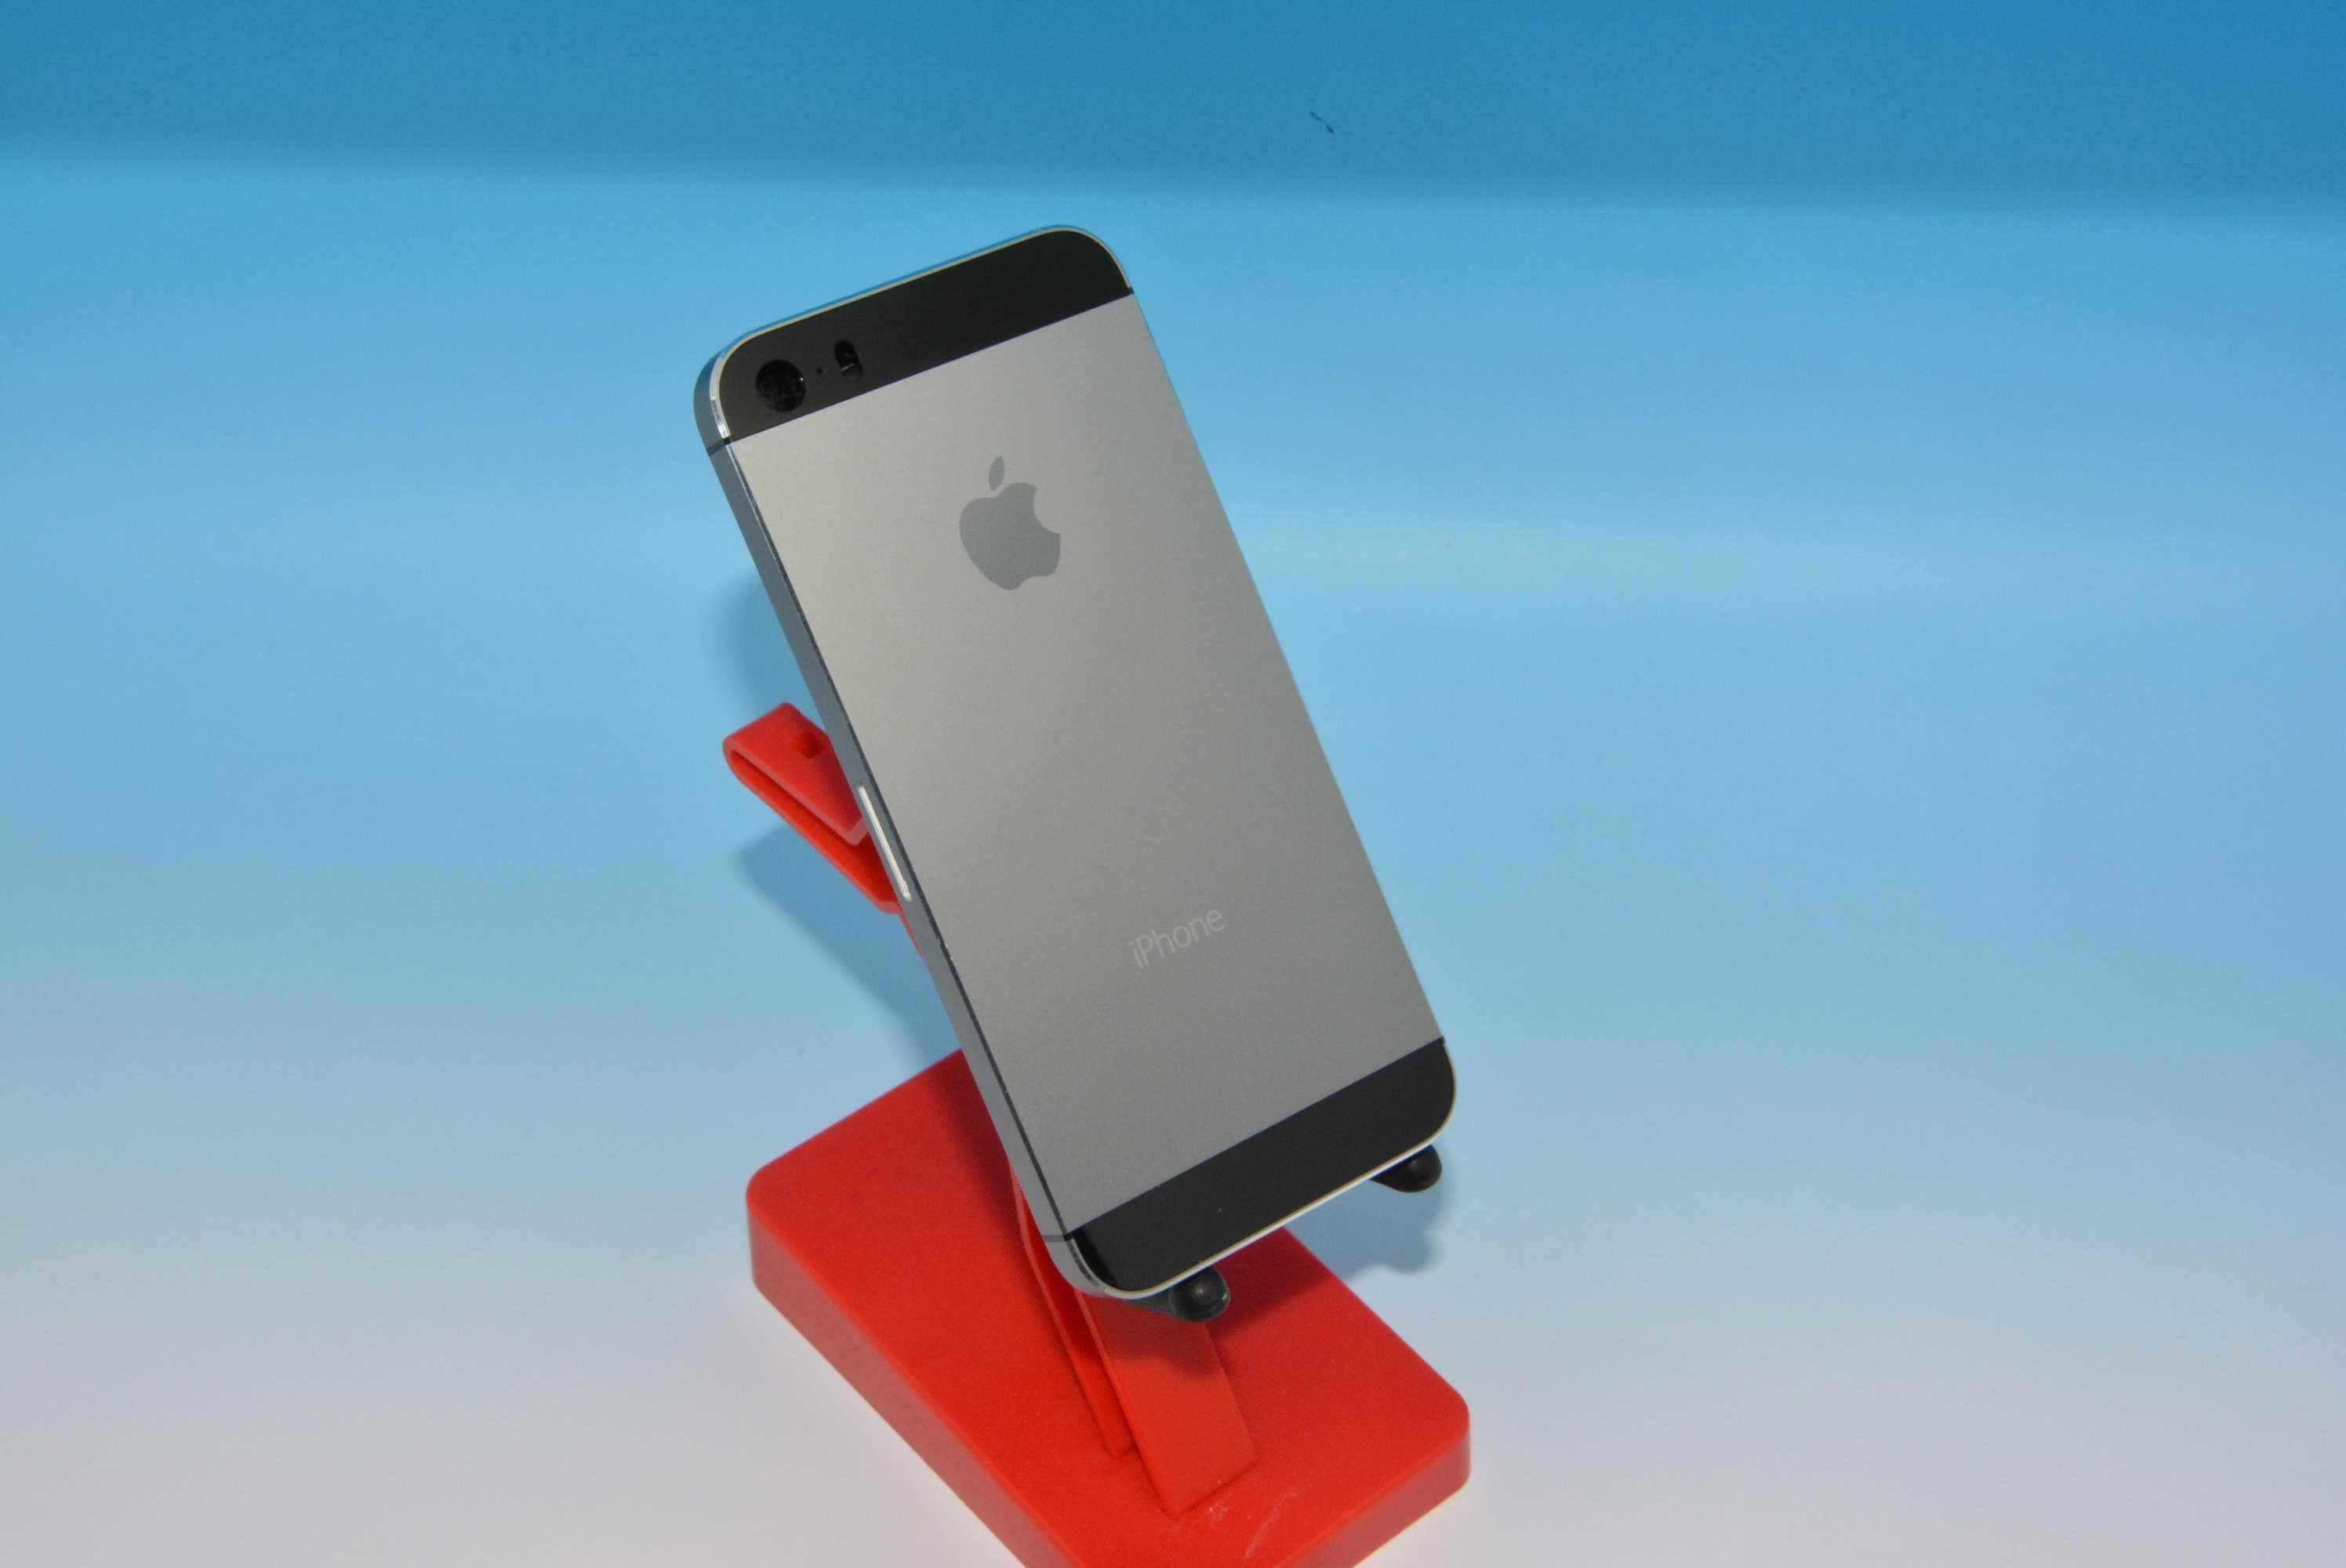 iPhone 5S grigio: nuova variante cromatica in arrivo?